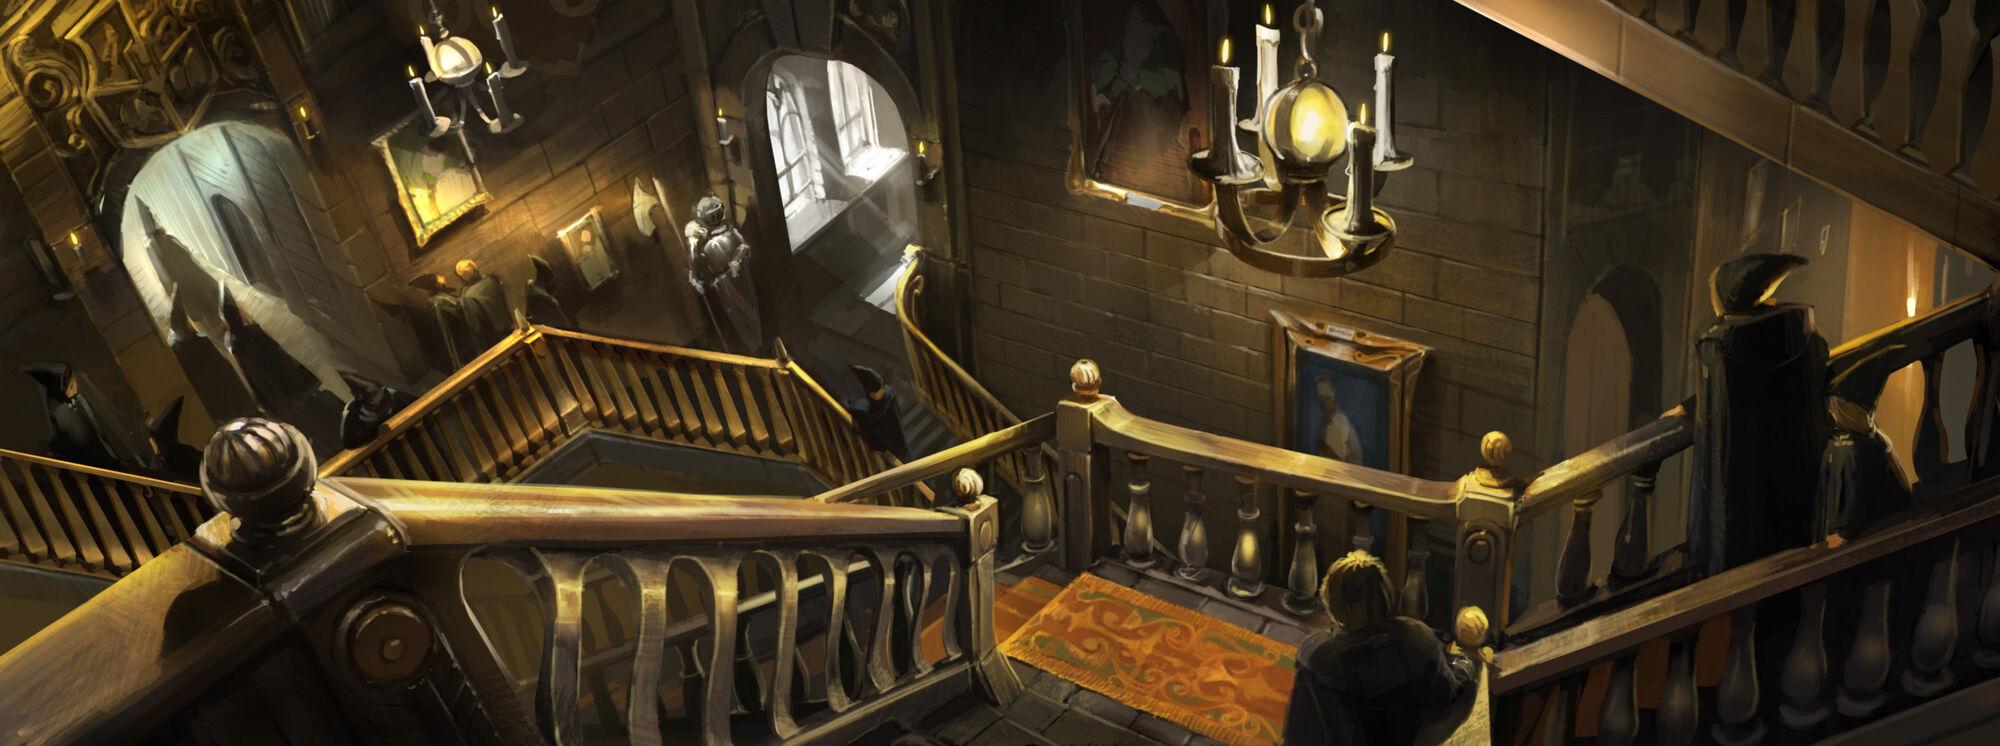 Les grands escaliers